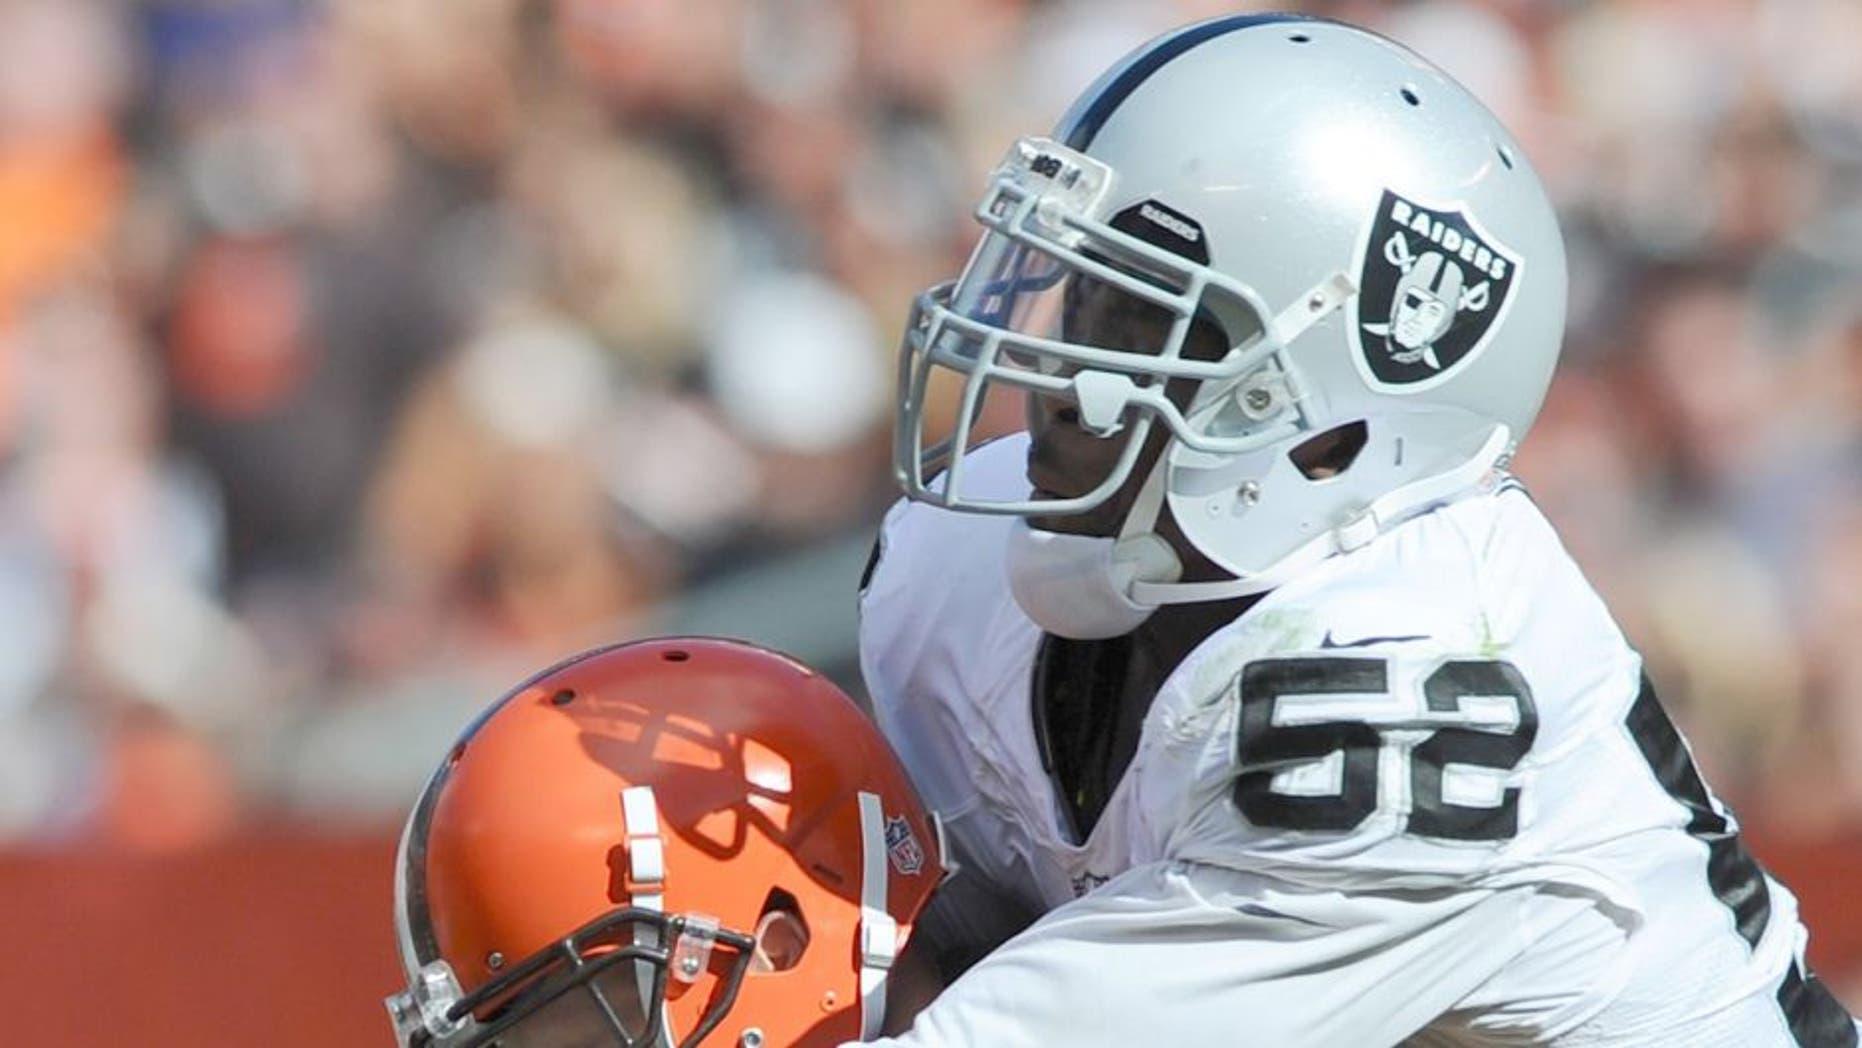 Sep 27, 2015; Cleveland, OH, USA; Oakland Raiders defensive end Khalil Mack (52) sacks Cleveland Browns quarterback Josh McCown (13) during the second half at FirstEnergy Stadium. The Raiders won 27-20. Mandatory Credit: Ken Blaze-USA TODAY Sports